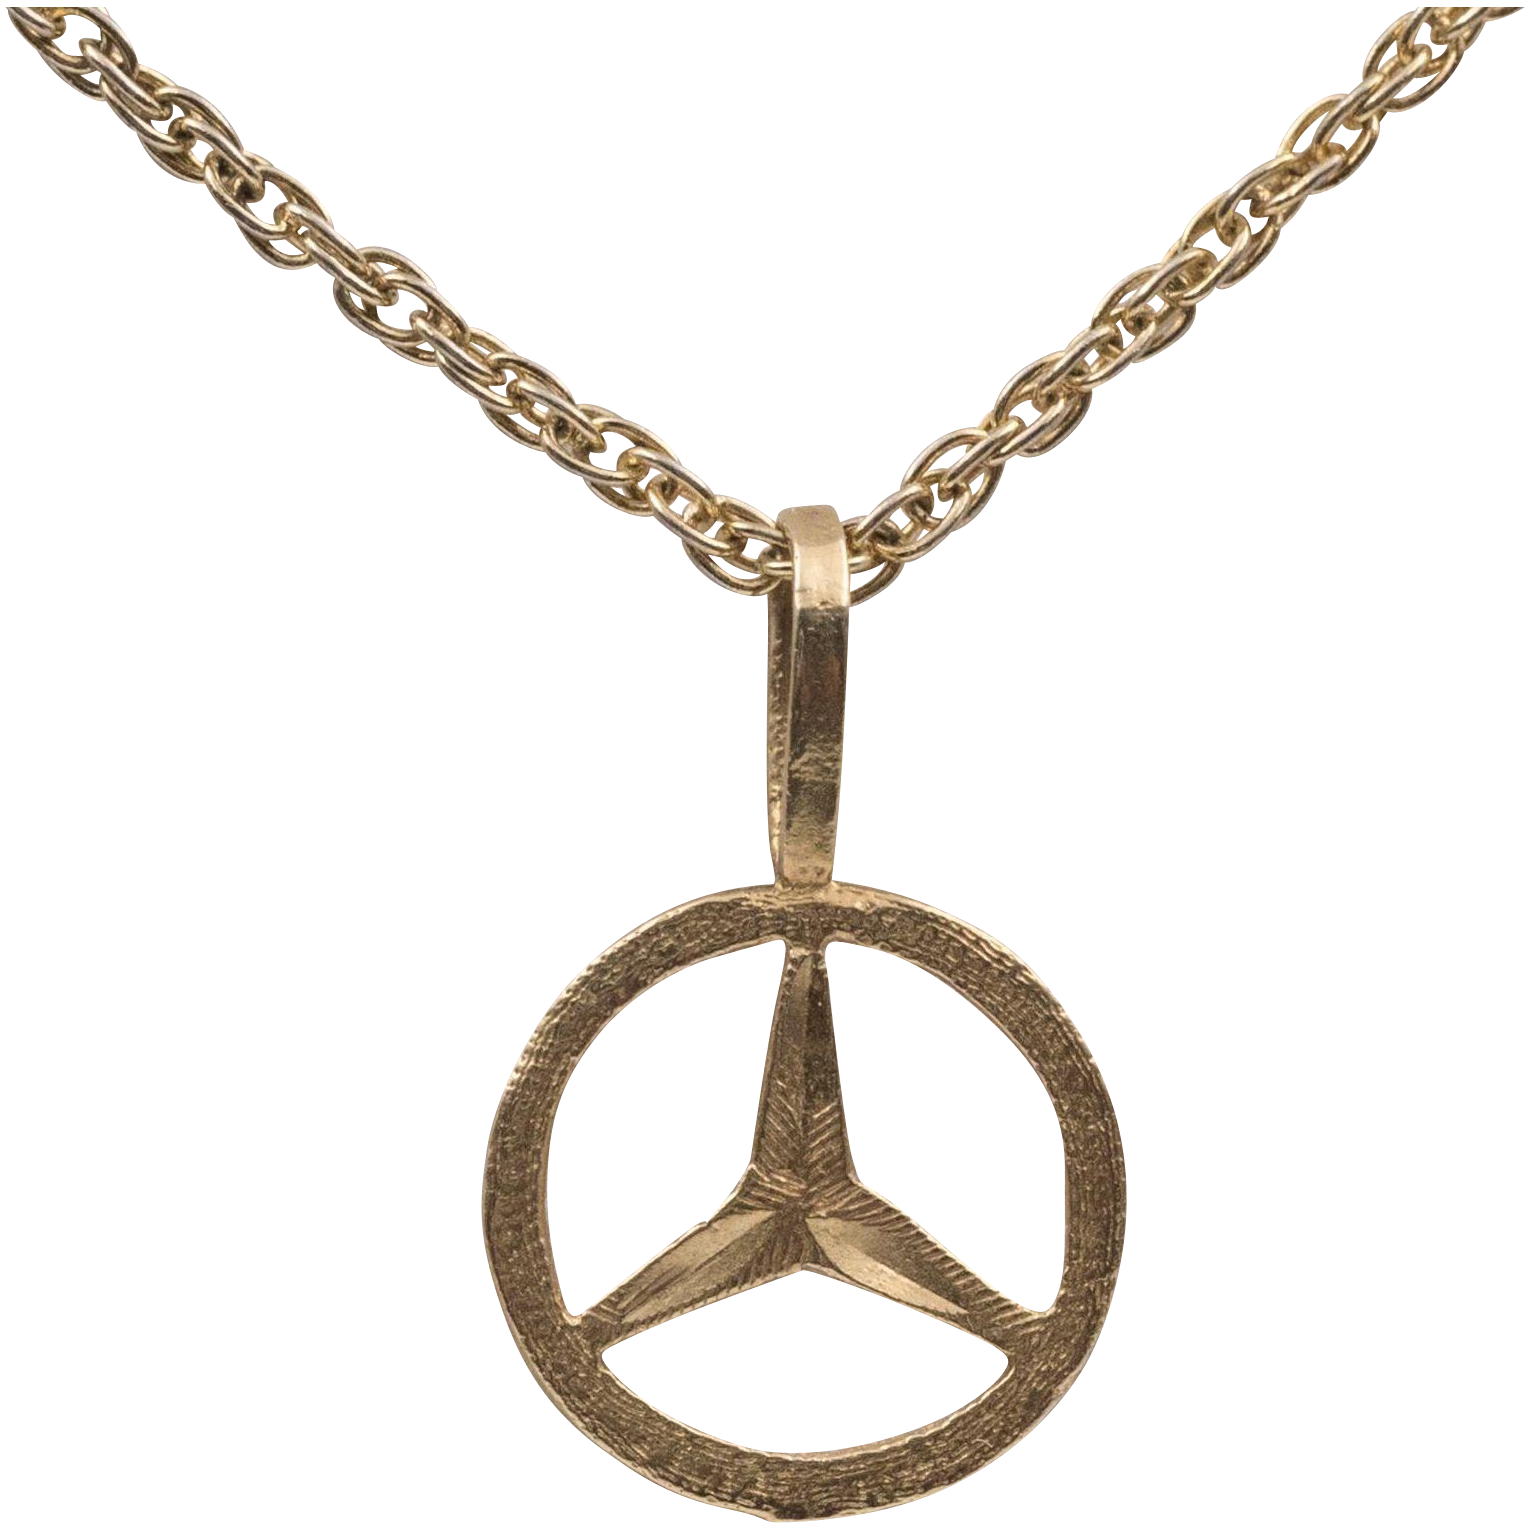 14k yg mercedes charm pendant from for 14k gold mercedes benz pendant